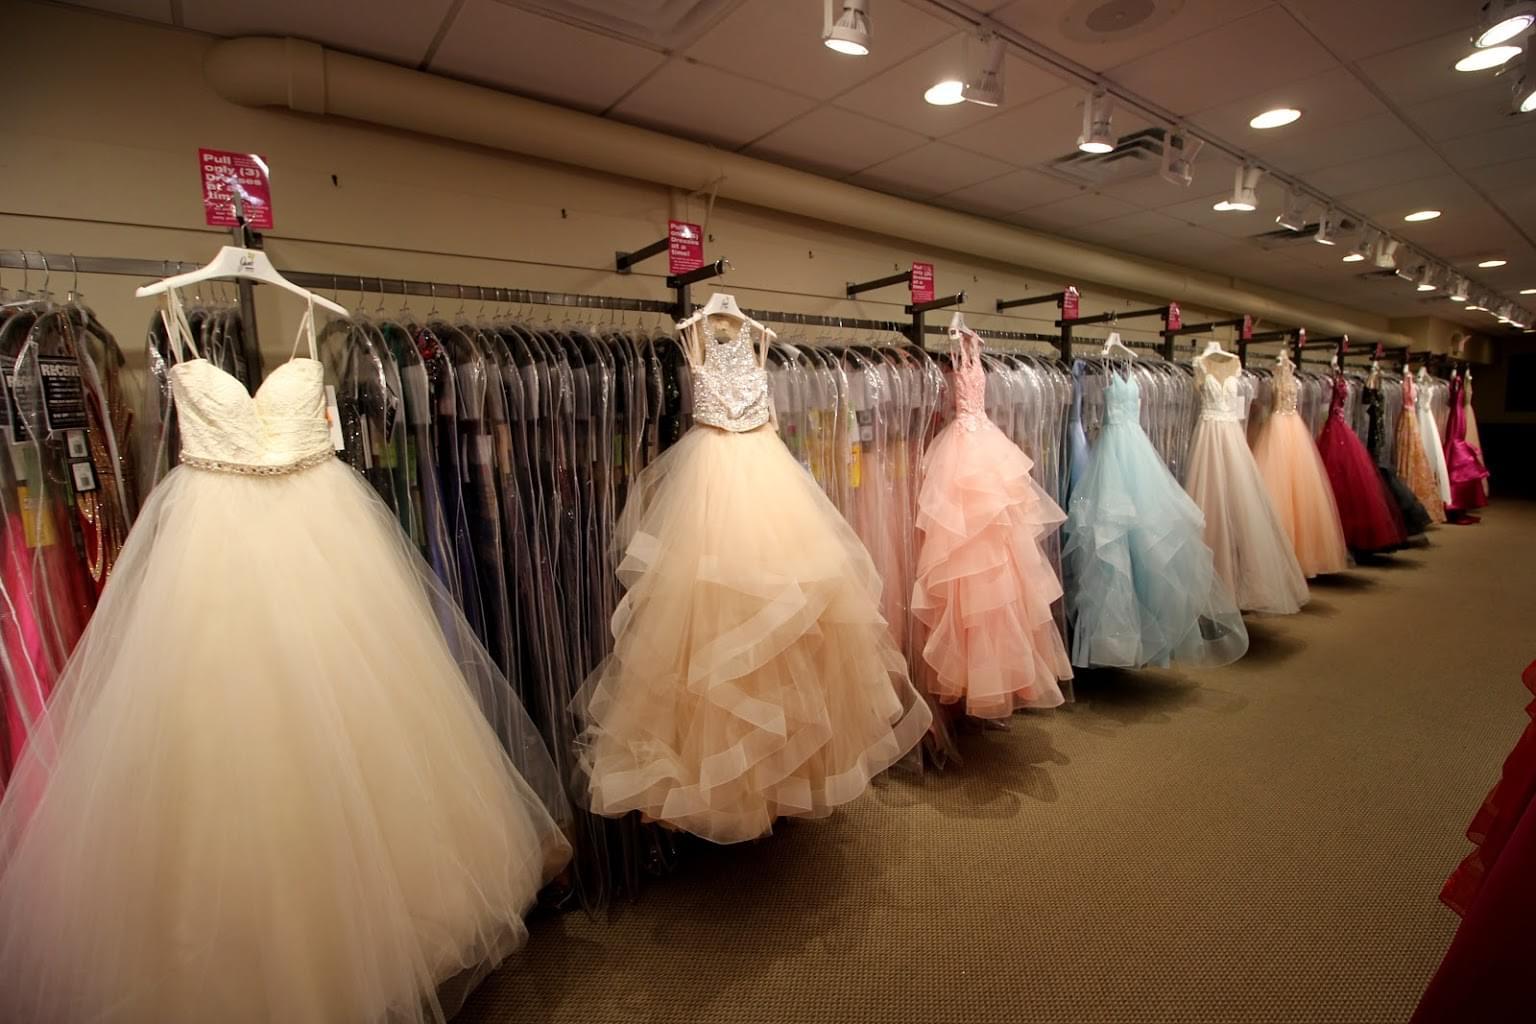 Jan's Boutique dress store in Cherry Hill, NJ